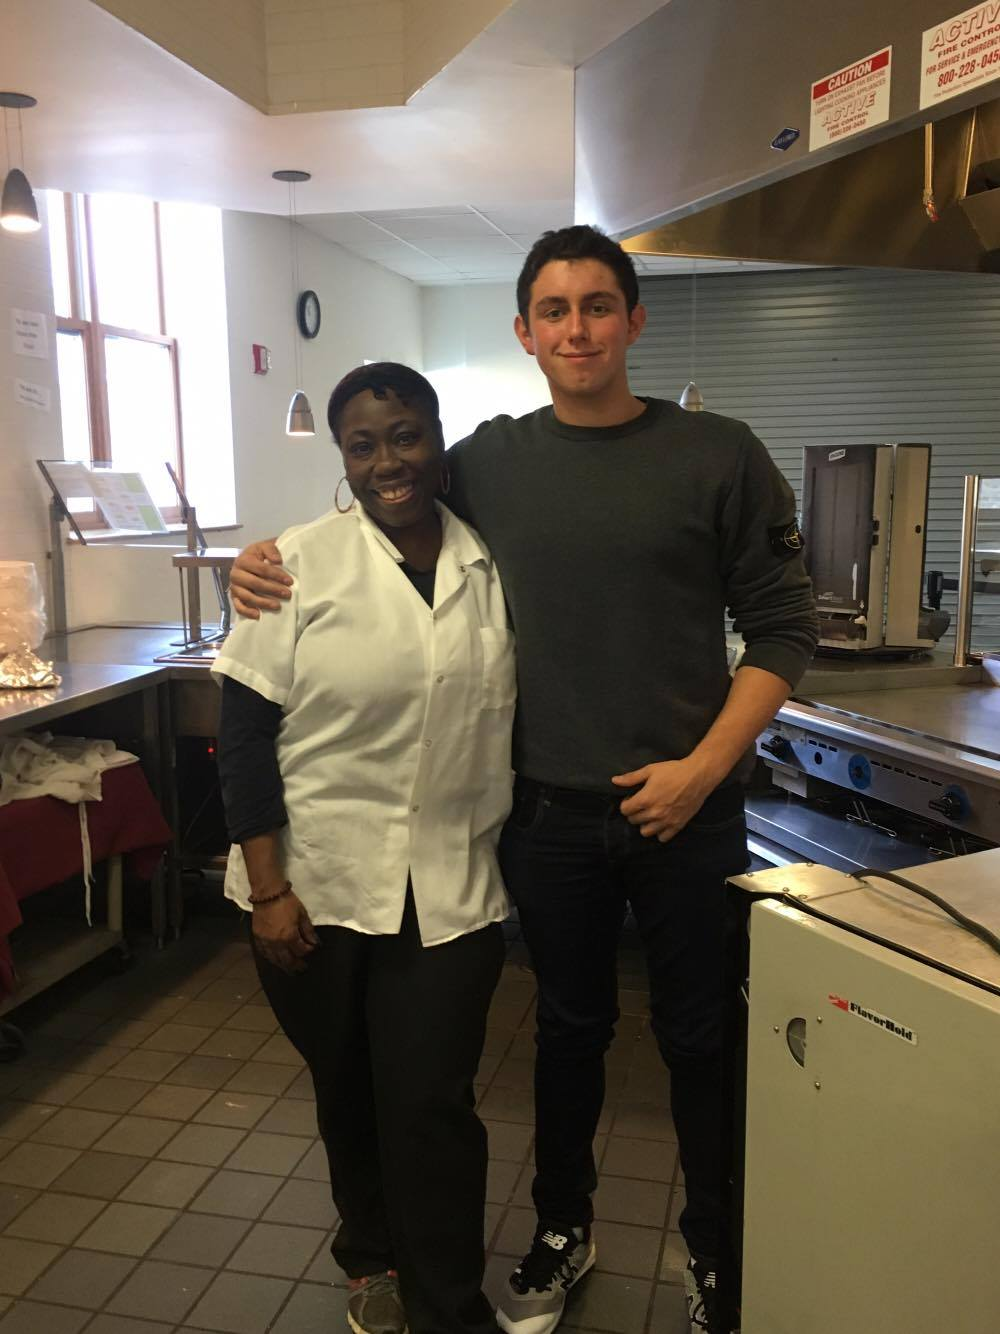 Photo Courtesy of Ross Krakower.  Ms. Nicole and Ross Krakower in the Student Center Cafeteria.